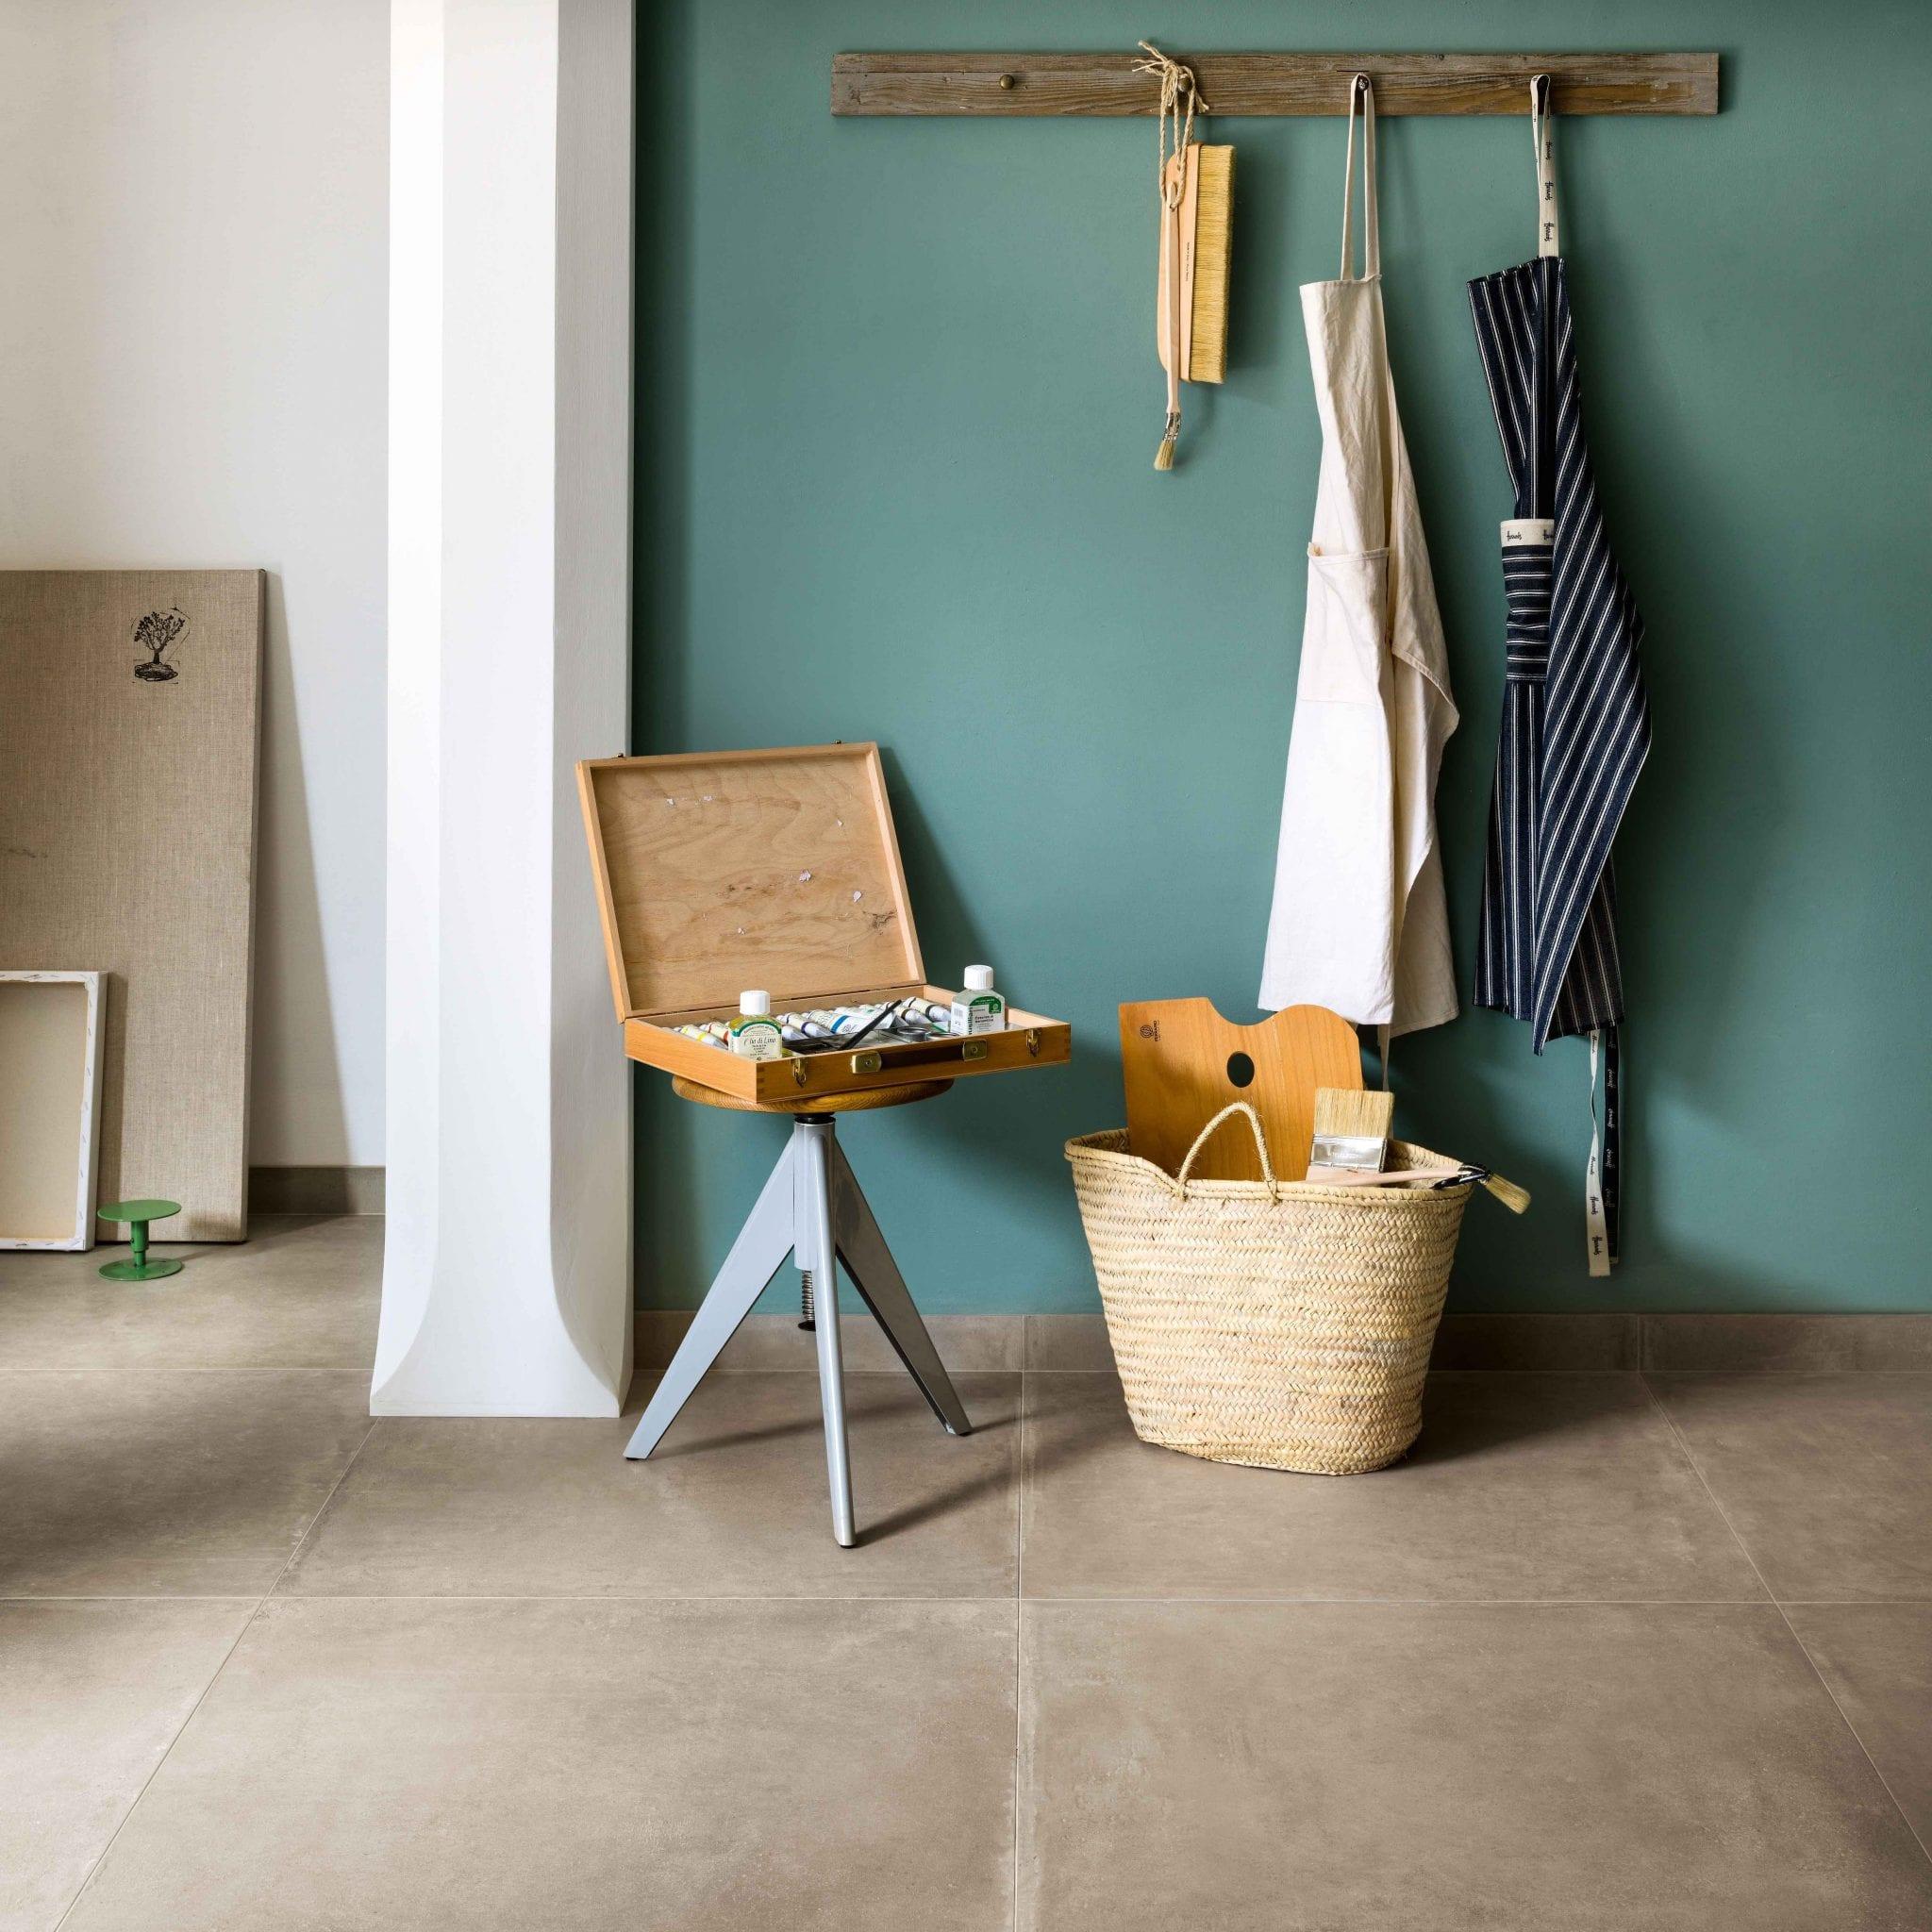 Råbjerg Mile fliser klinker entréfliser claymood piemme